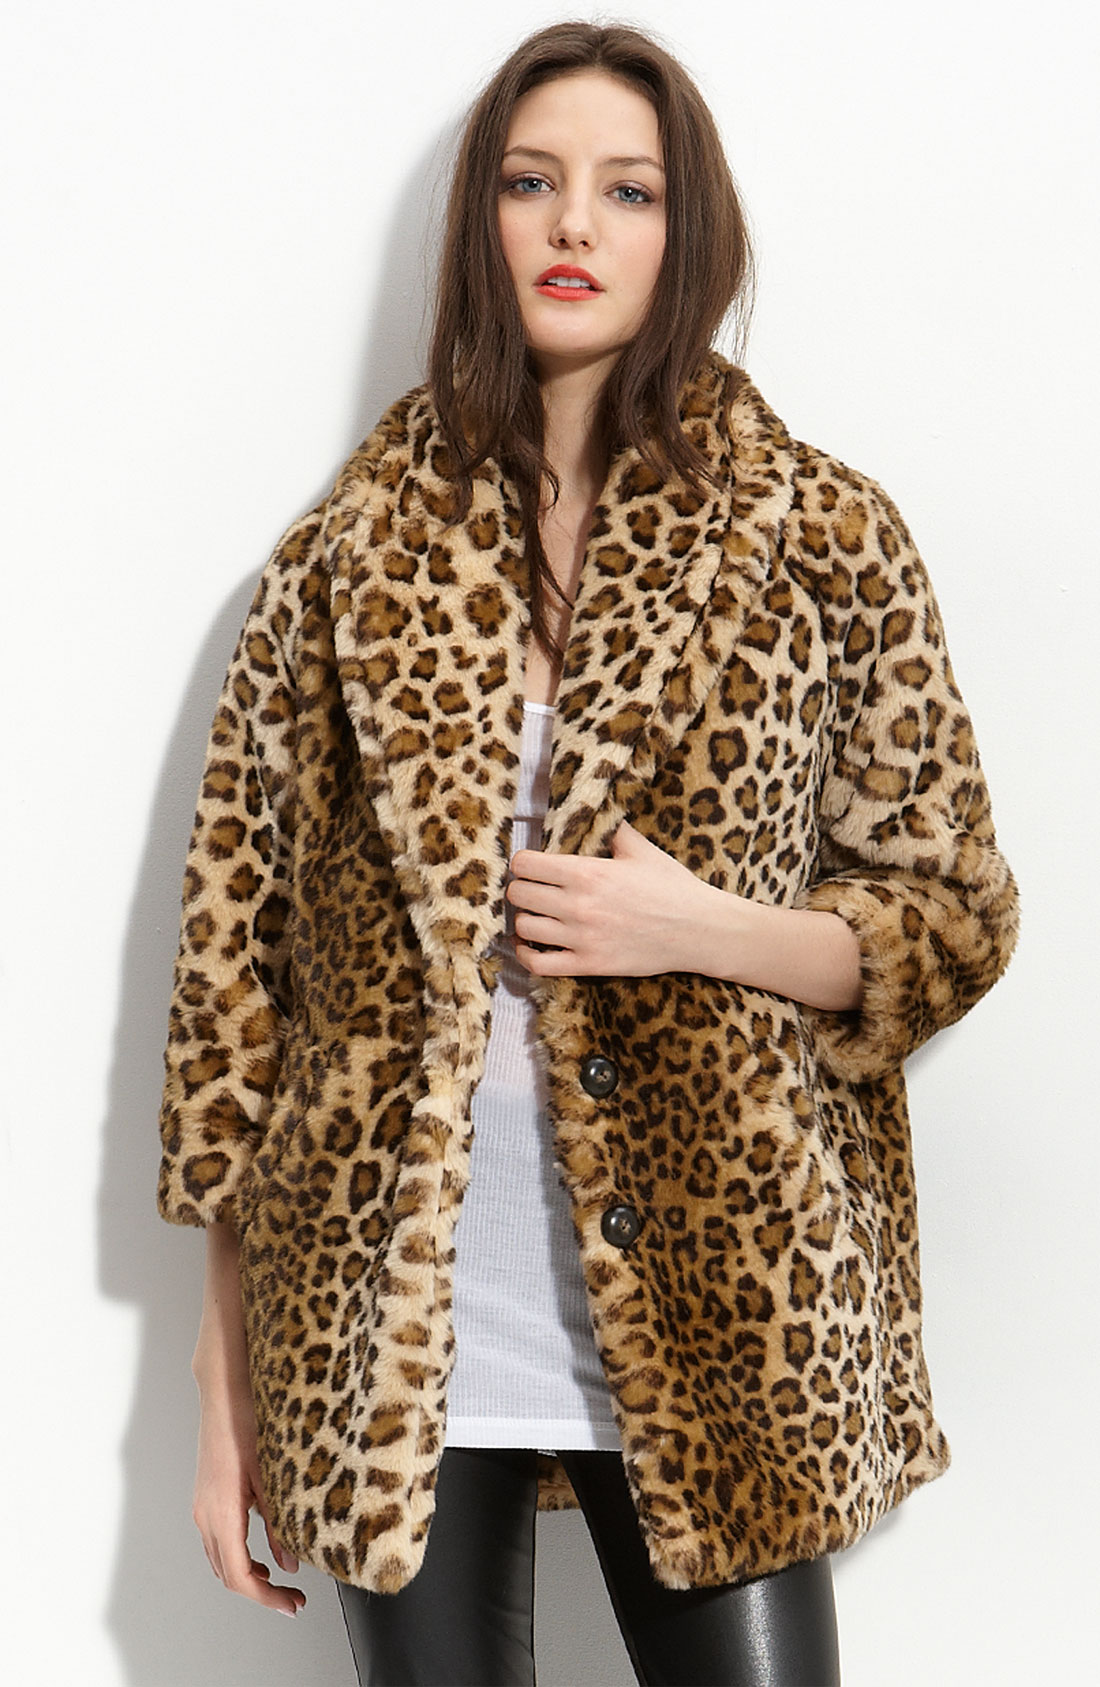 Pam & Gela Leopard Faux Fur Coat at bestsupsm5.cf - FASTEST FREE SHIPPING WORLDWIDE. Buy Pam & Gela Online.